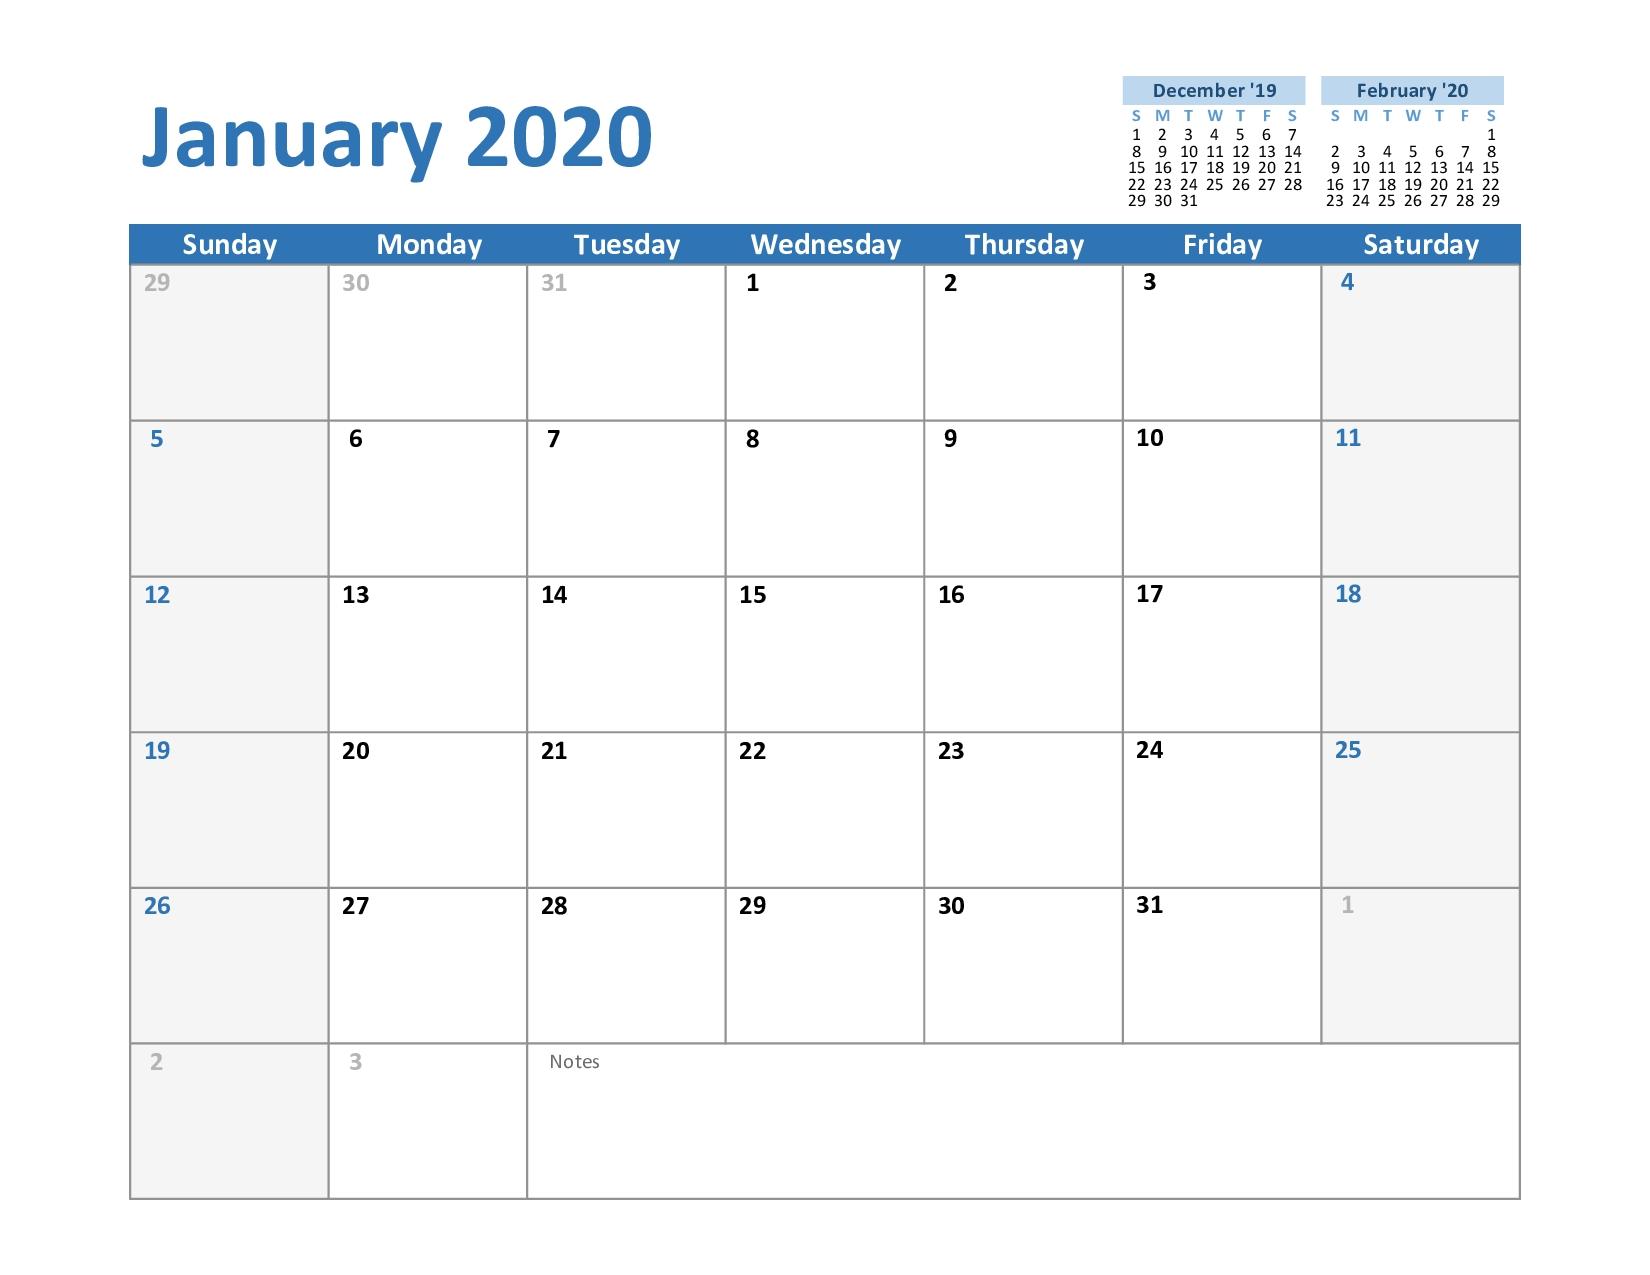 Free January 2020 Printable Calendar Blank In Pdf, Excel-Microsoft Word Calendar Template 2020 Edit